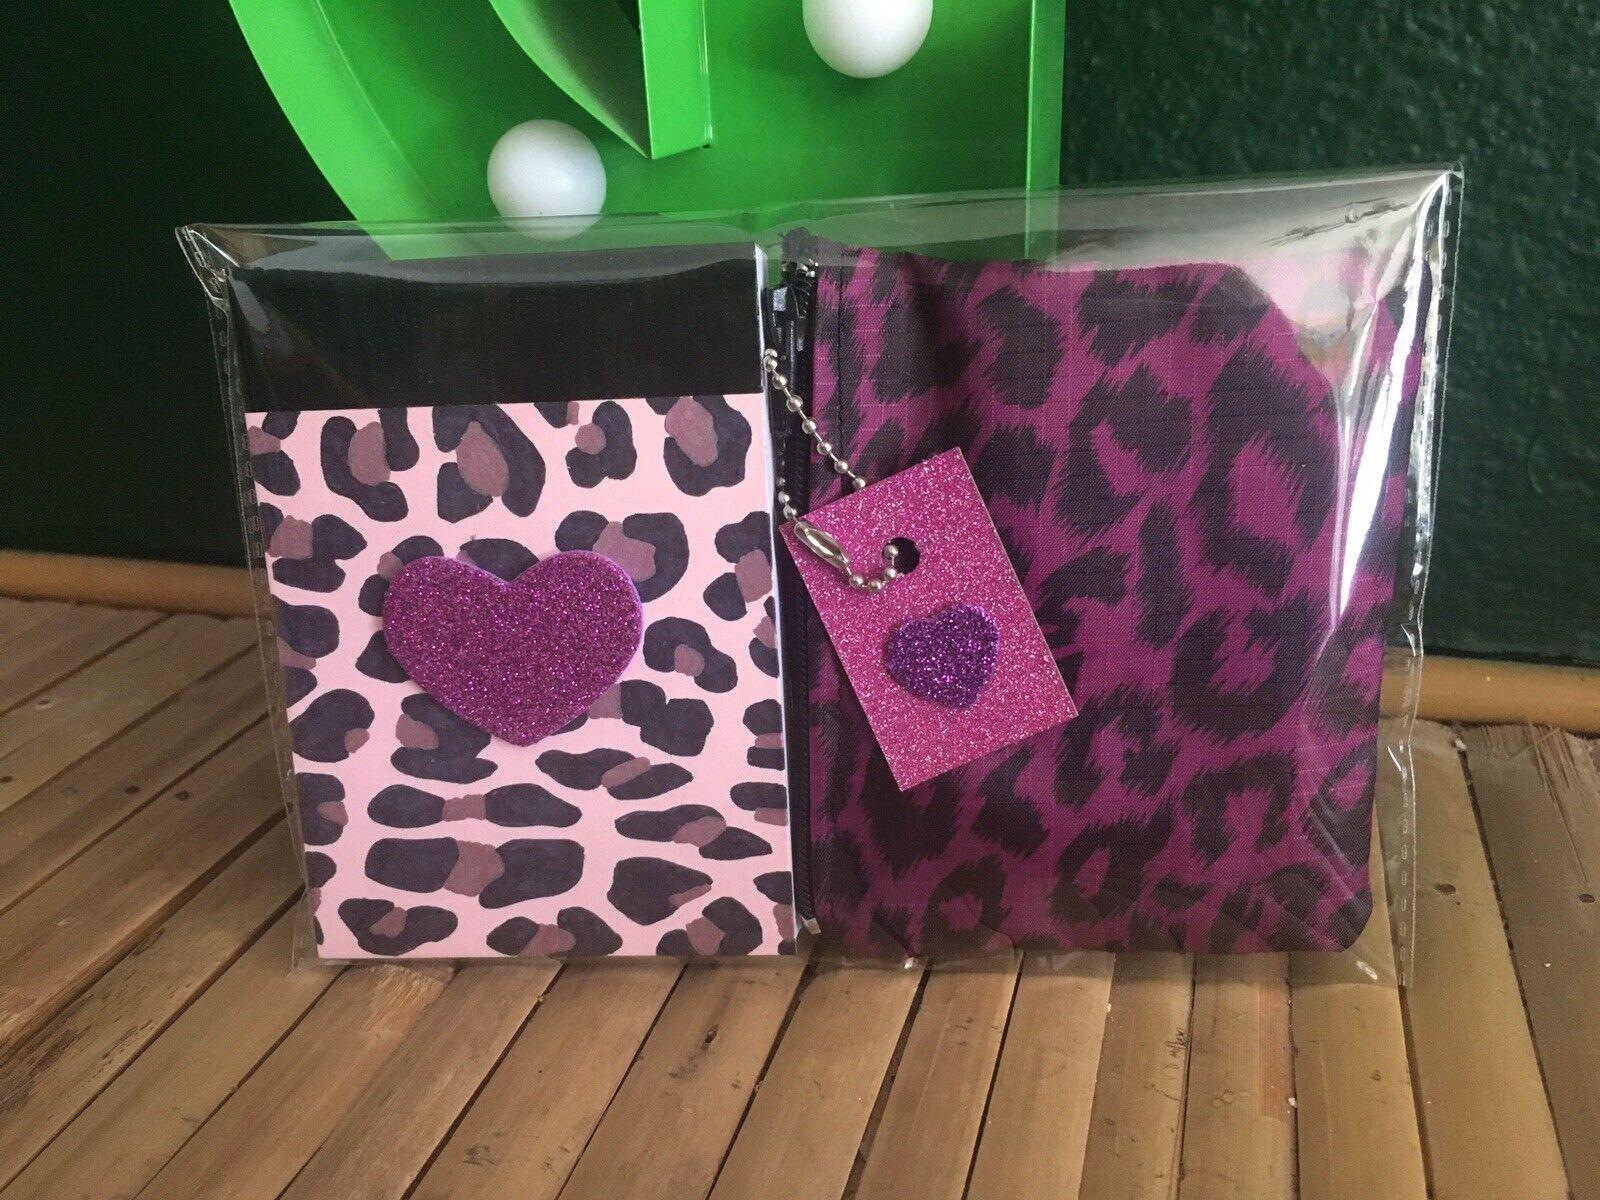 Retro Pink Leopard Print Waterproof Coin Purse +A7 Heart Notebook 2pc Gift Set